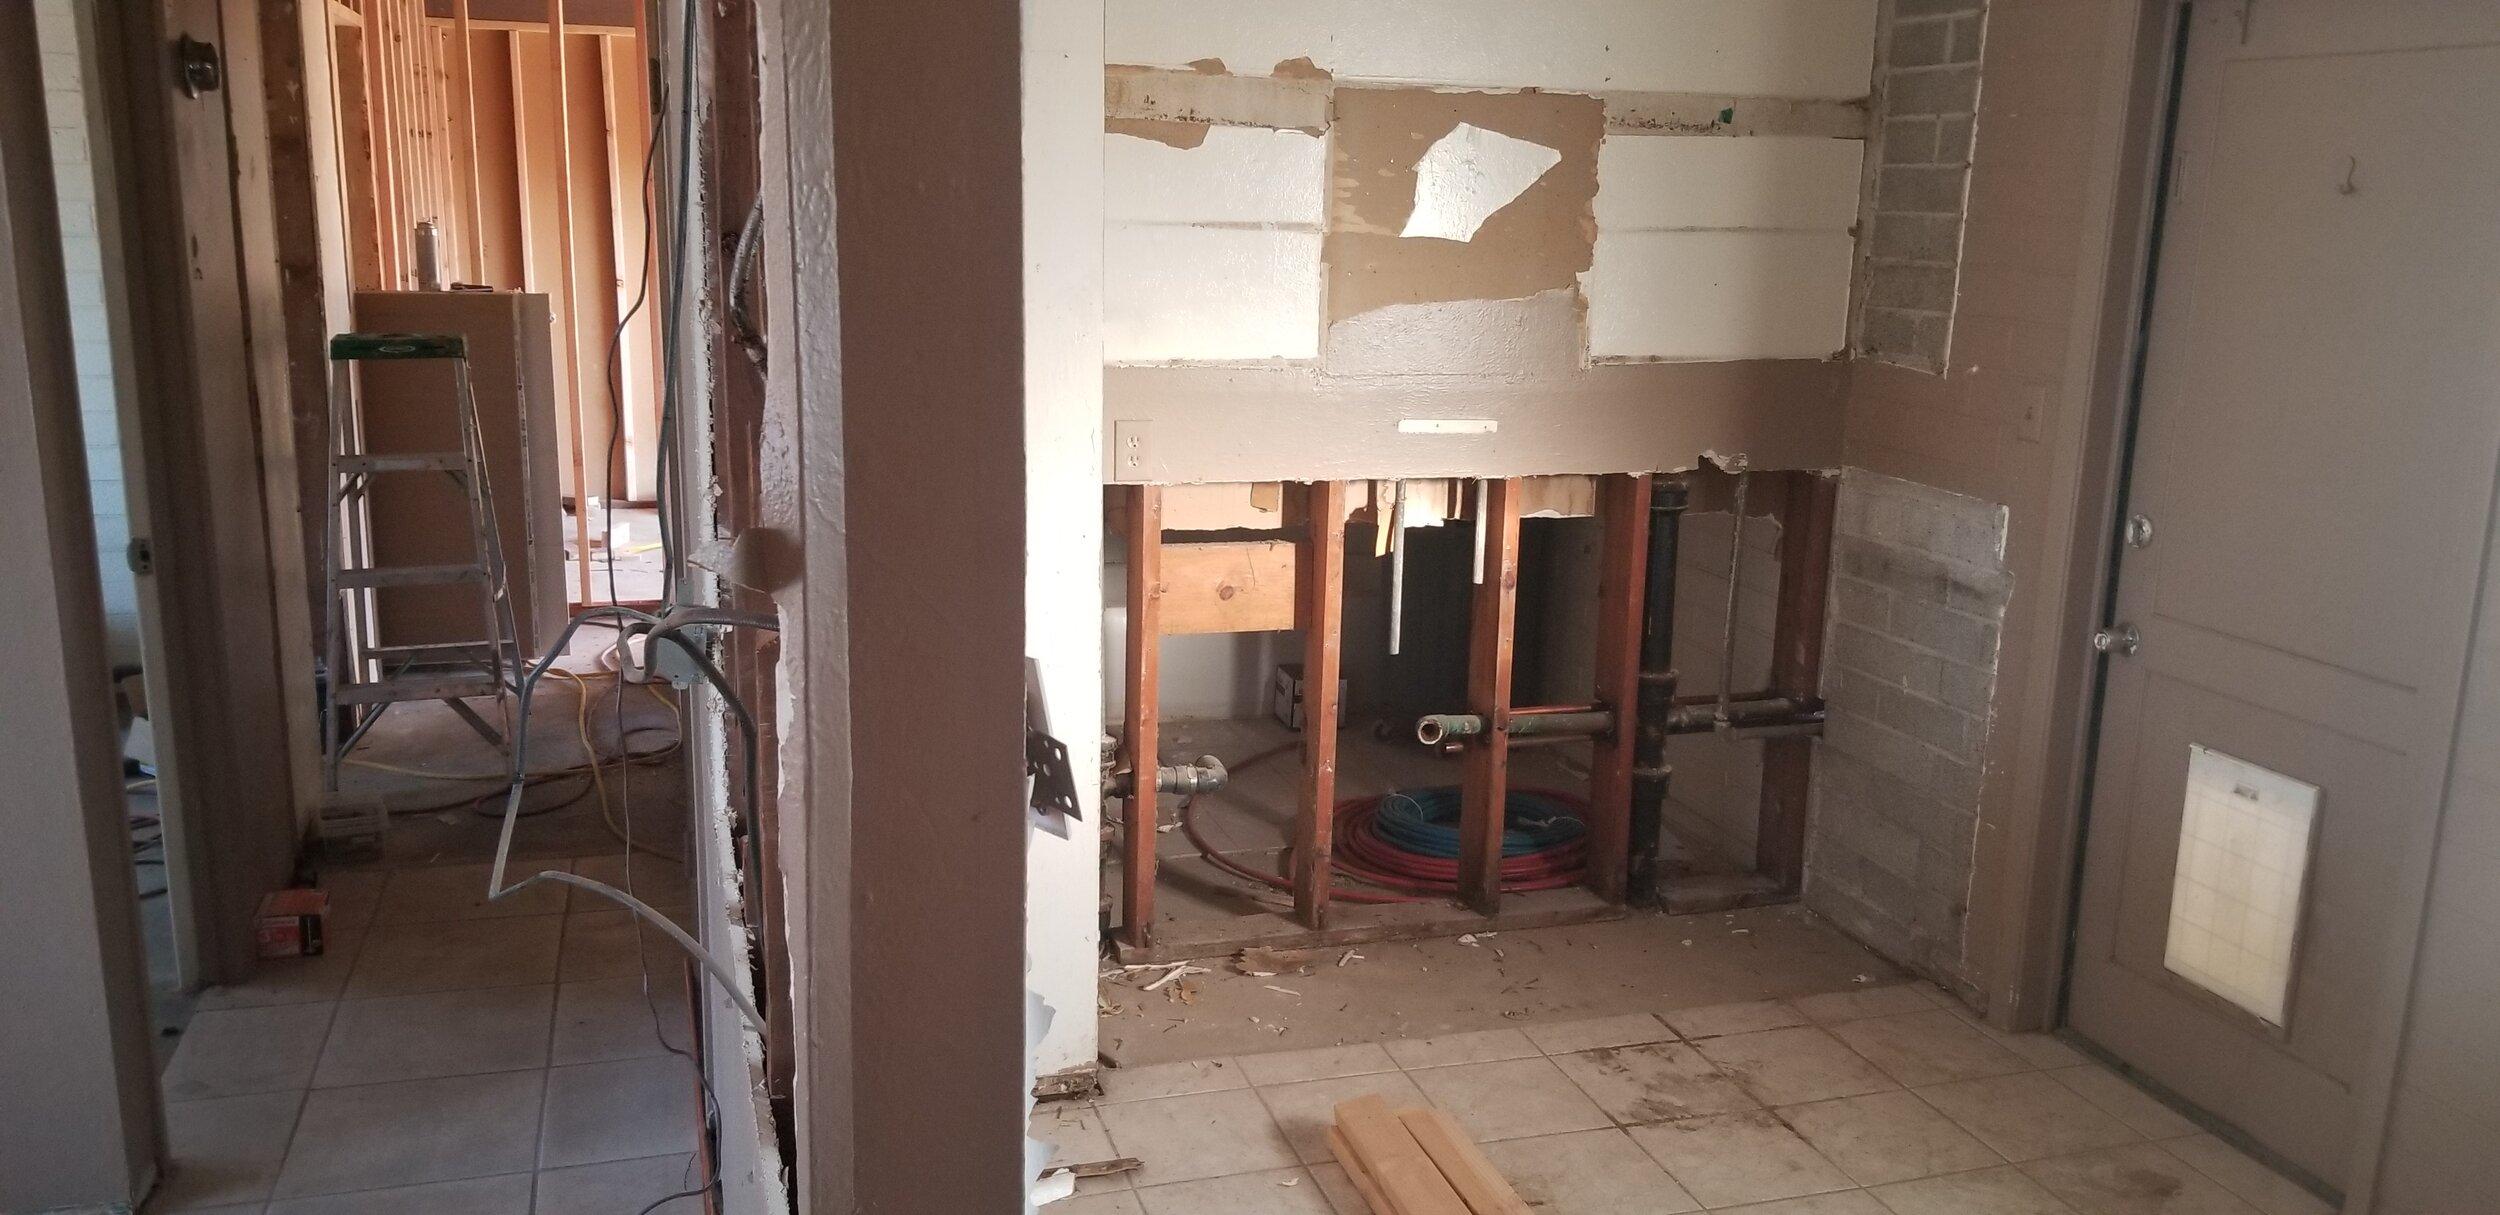 Kitchen & hall demo complete